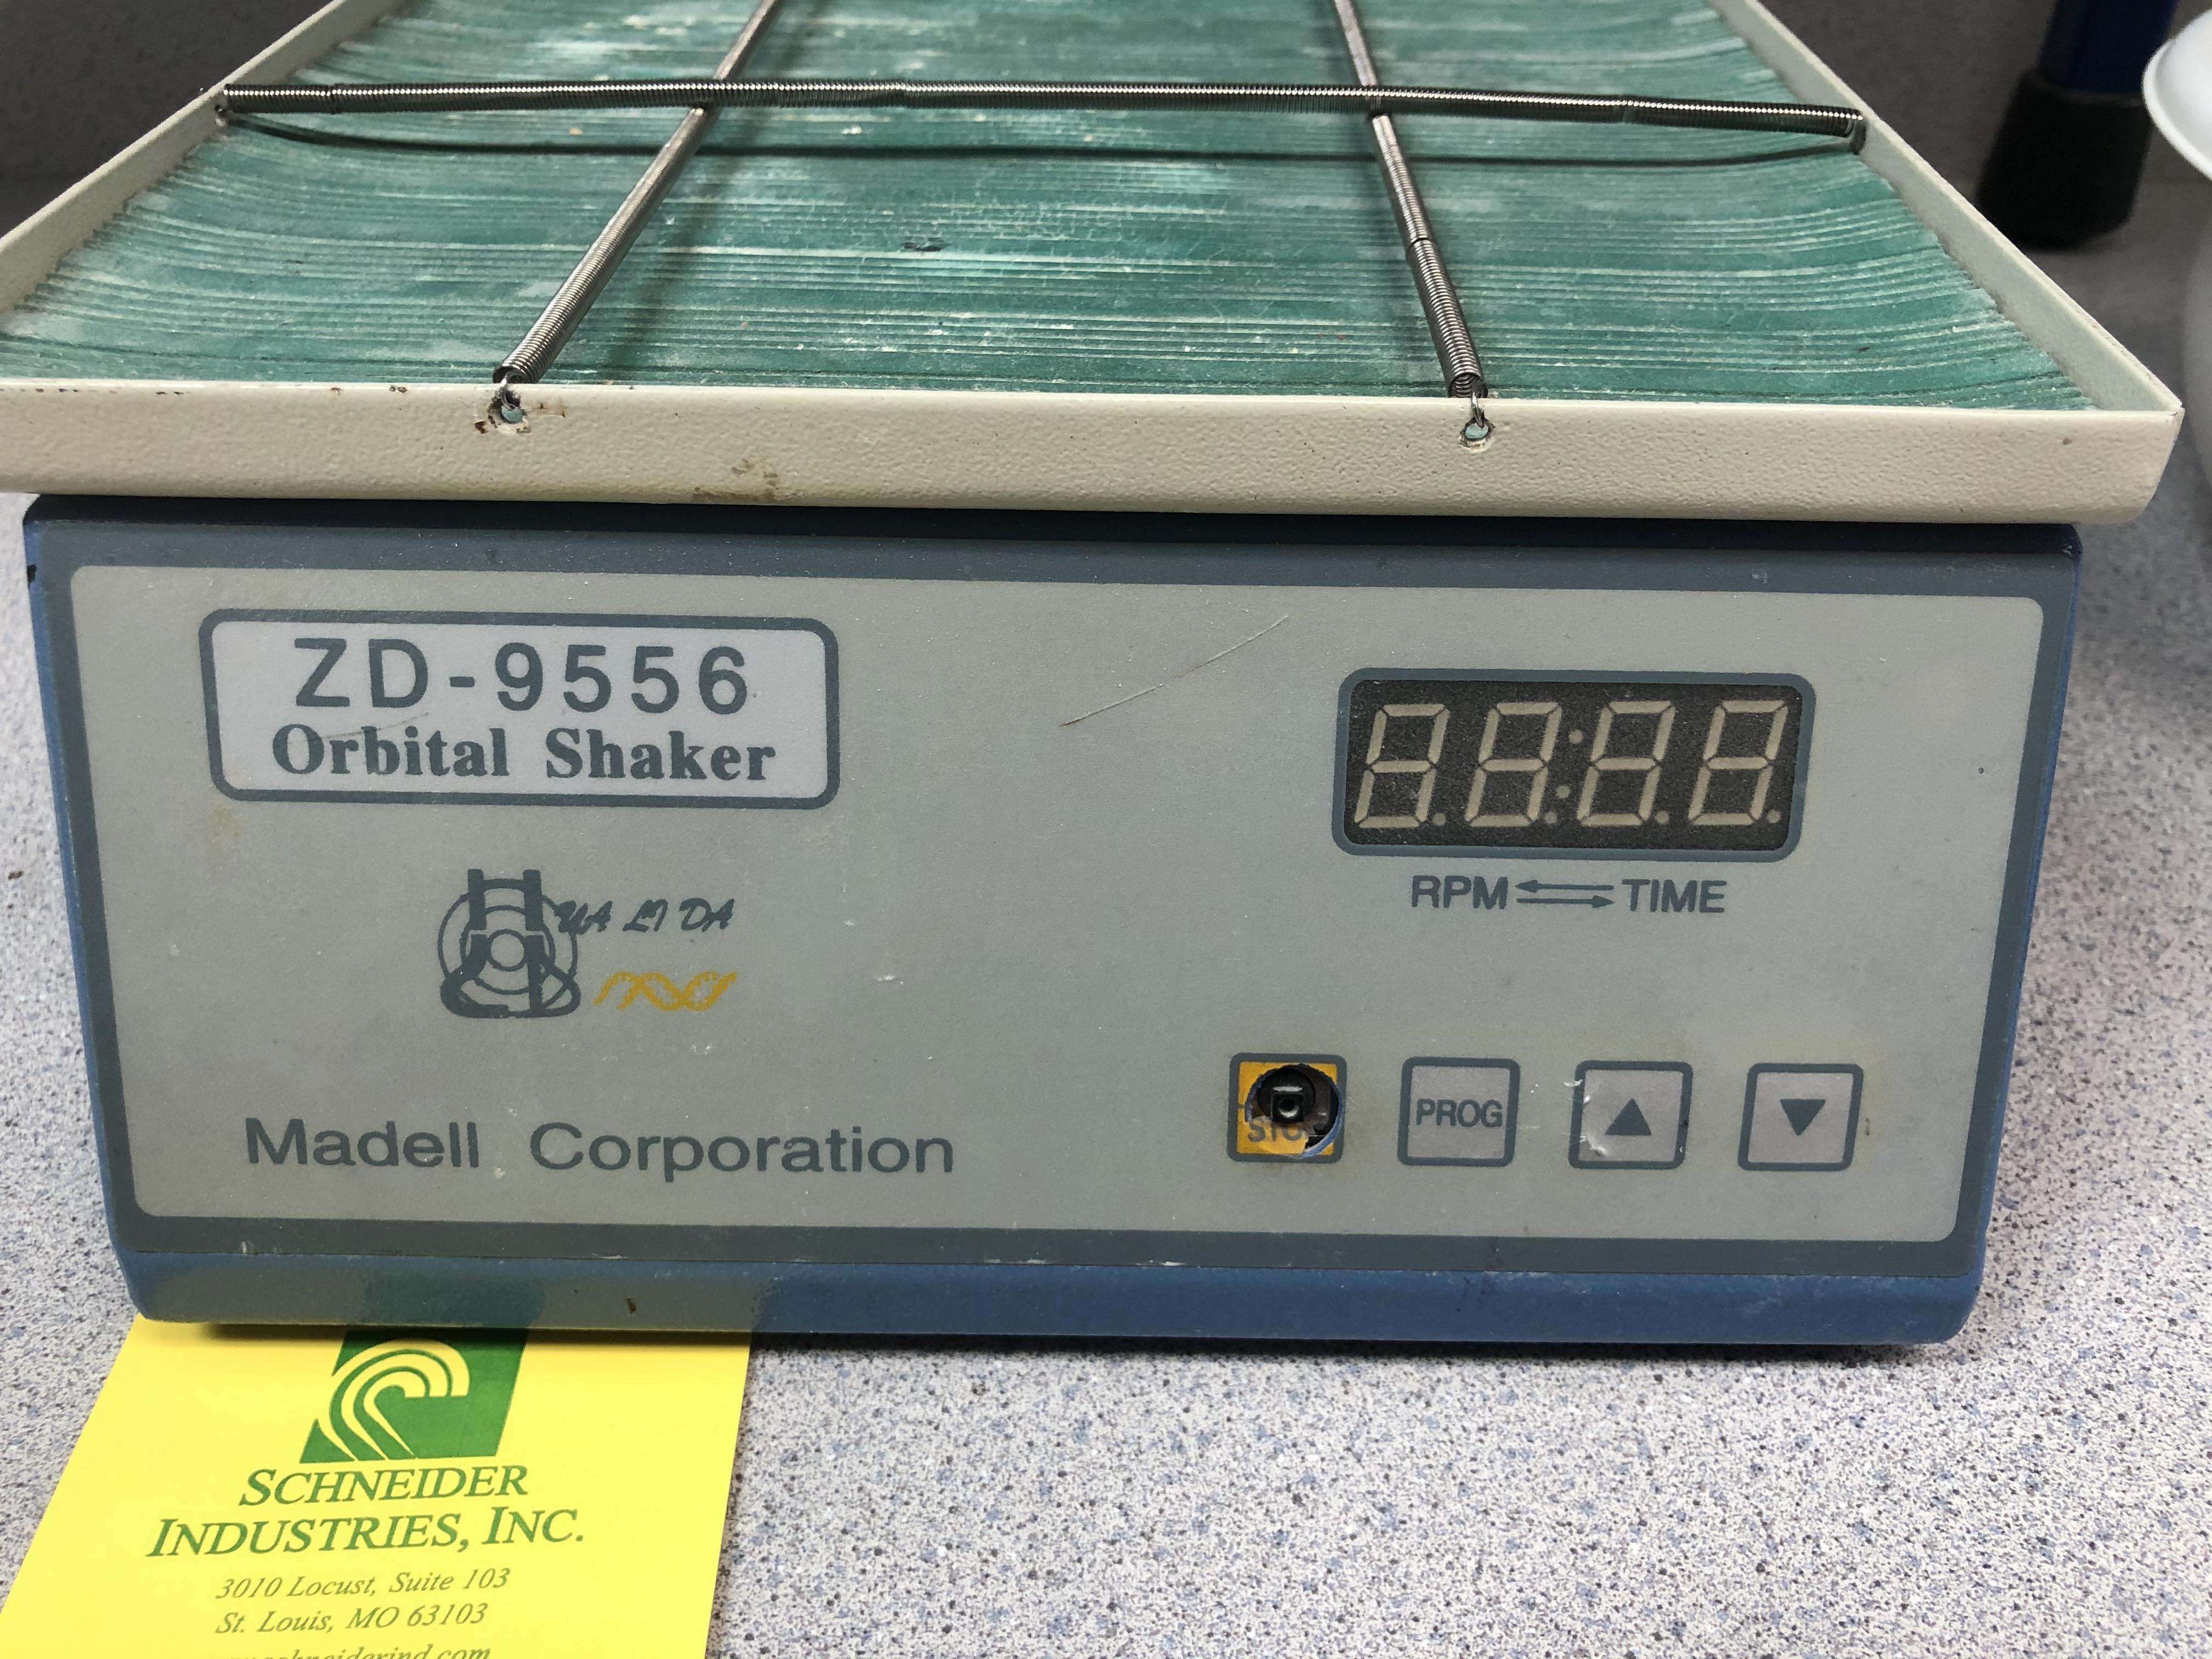 Madell Corporation Orbital Shaker, Model# ZD-9556, Serial# 205108 - Image 2 of 4